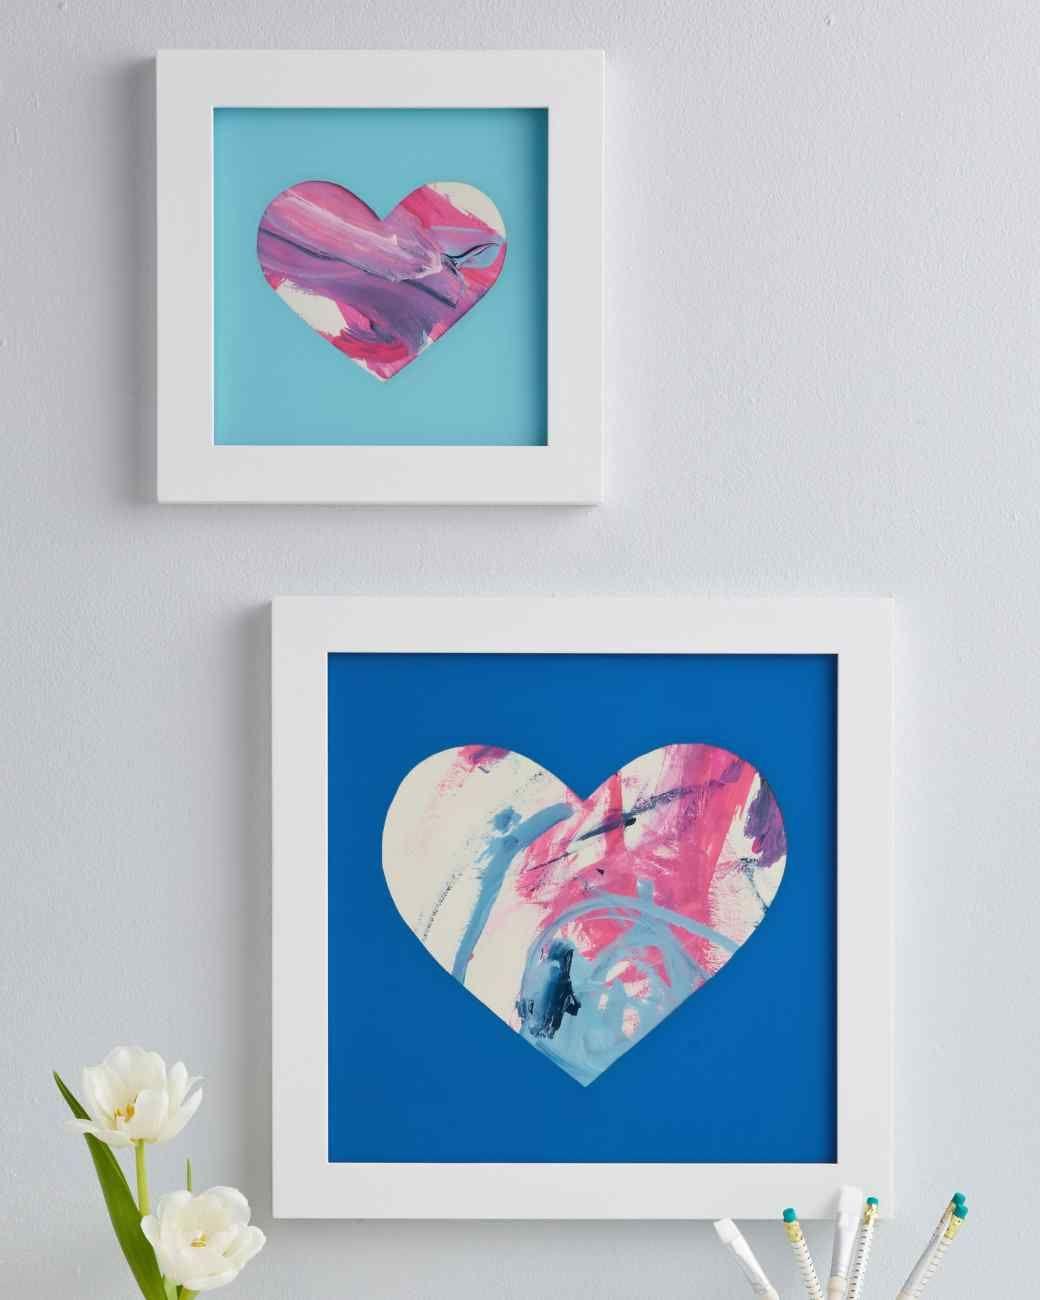 Heart framed shadow box heart shaped frame shadow box for Diy map heart frame